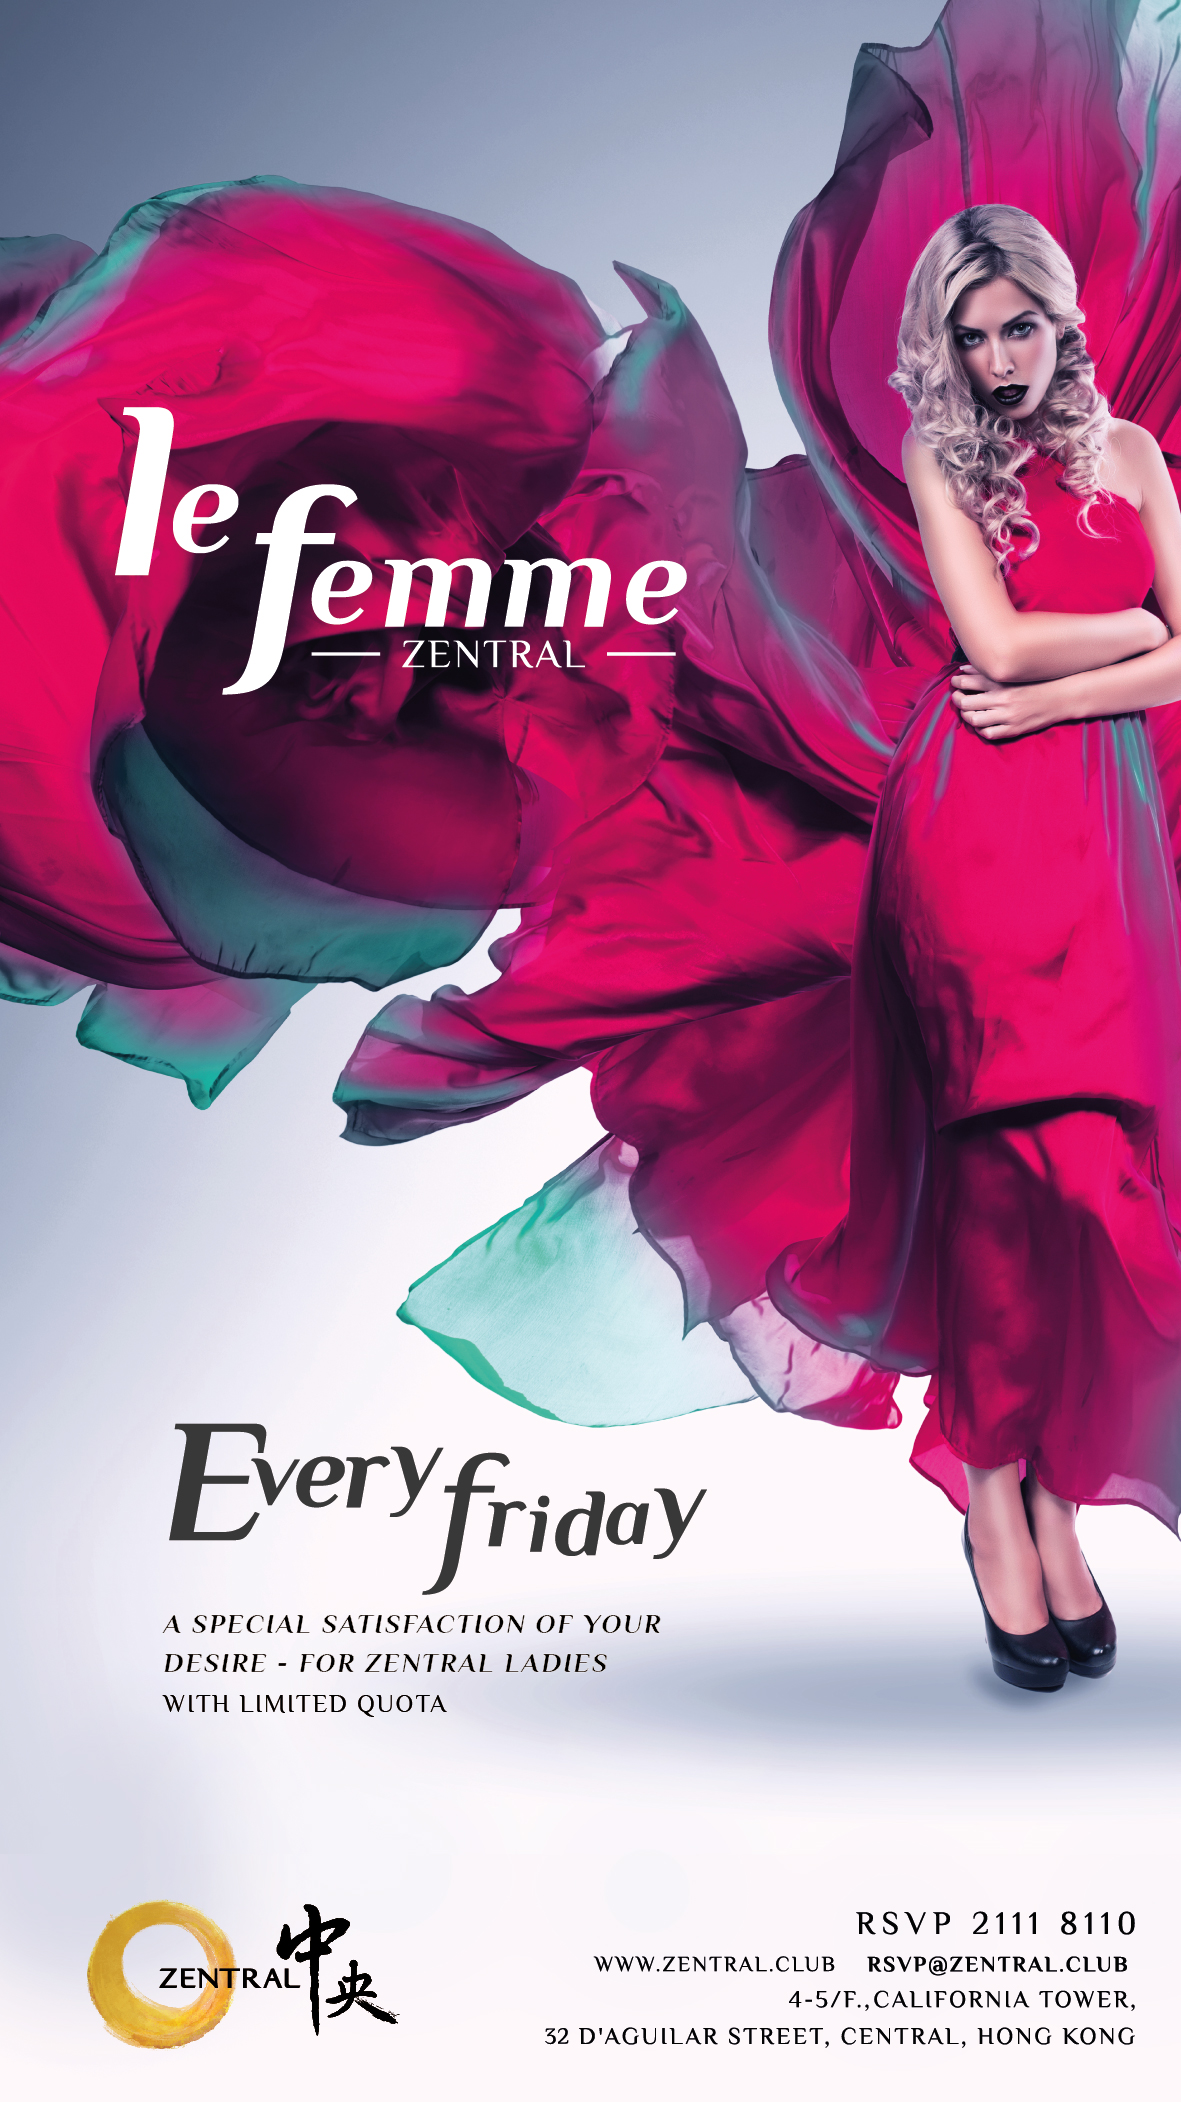 ZT_LE FEMME_FRIDAY